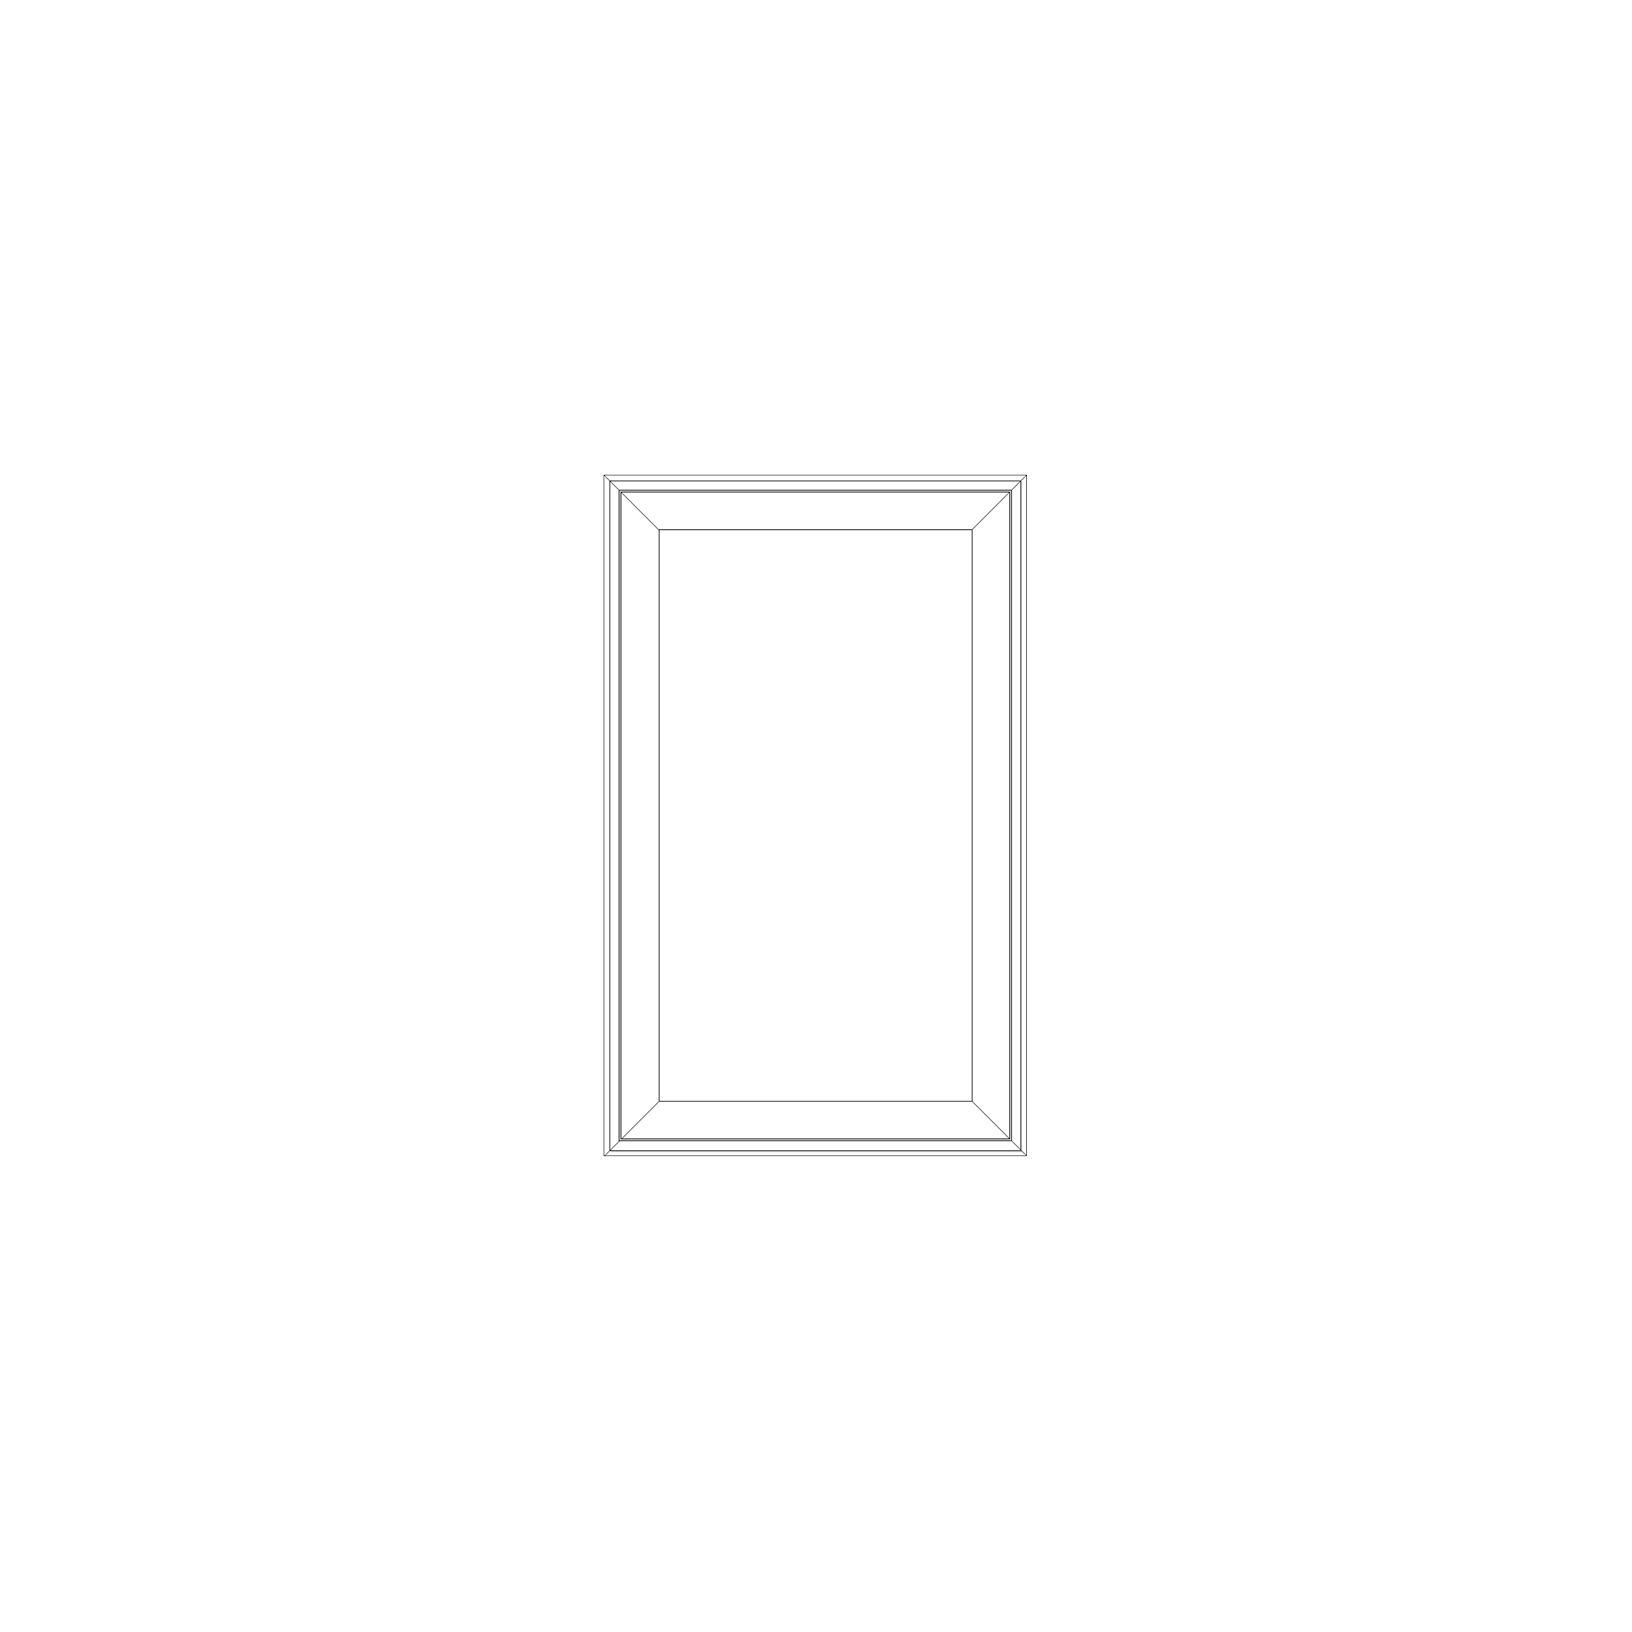 EDGE 1-SEKTION 1 dörr